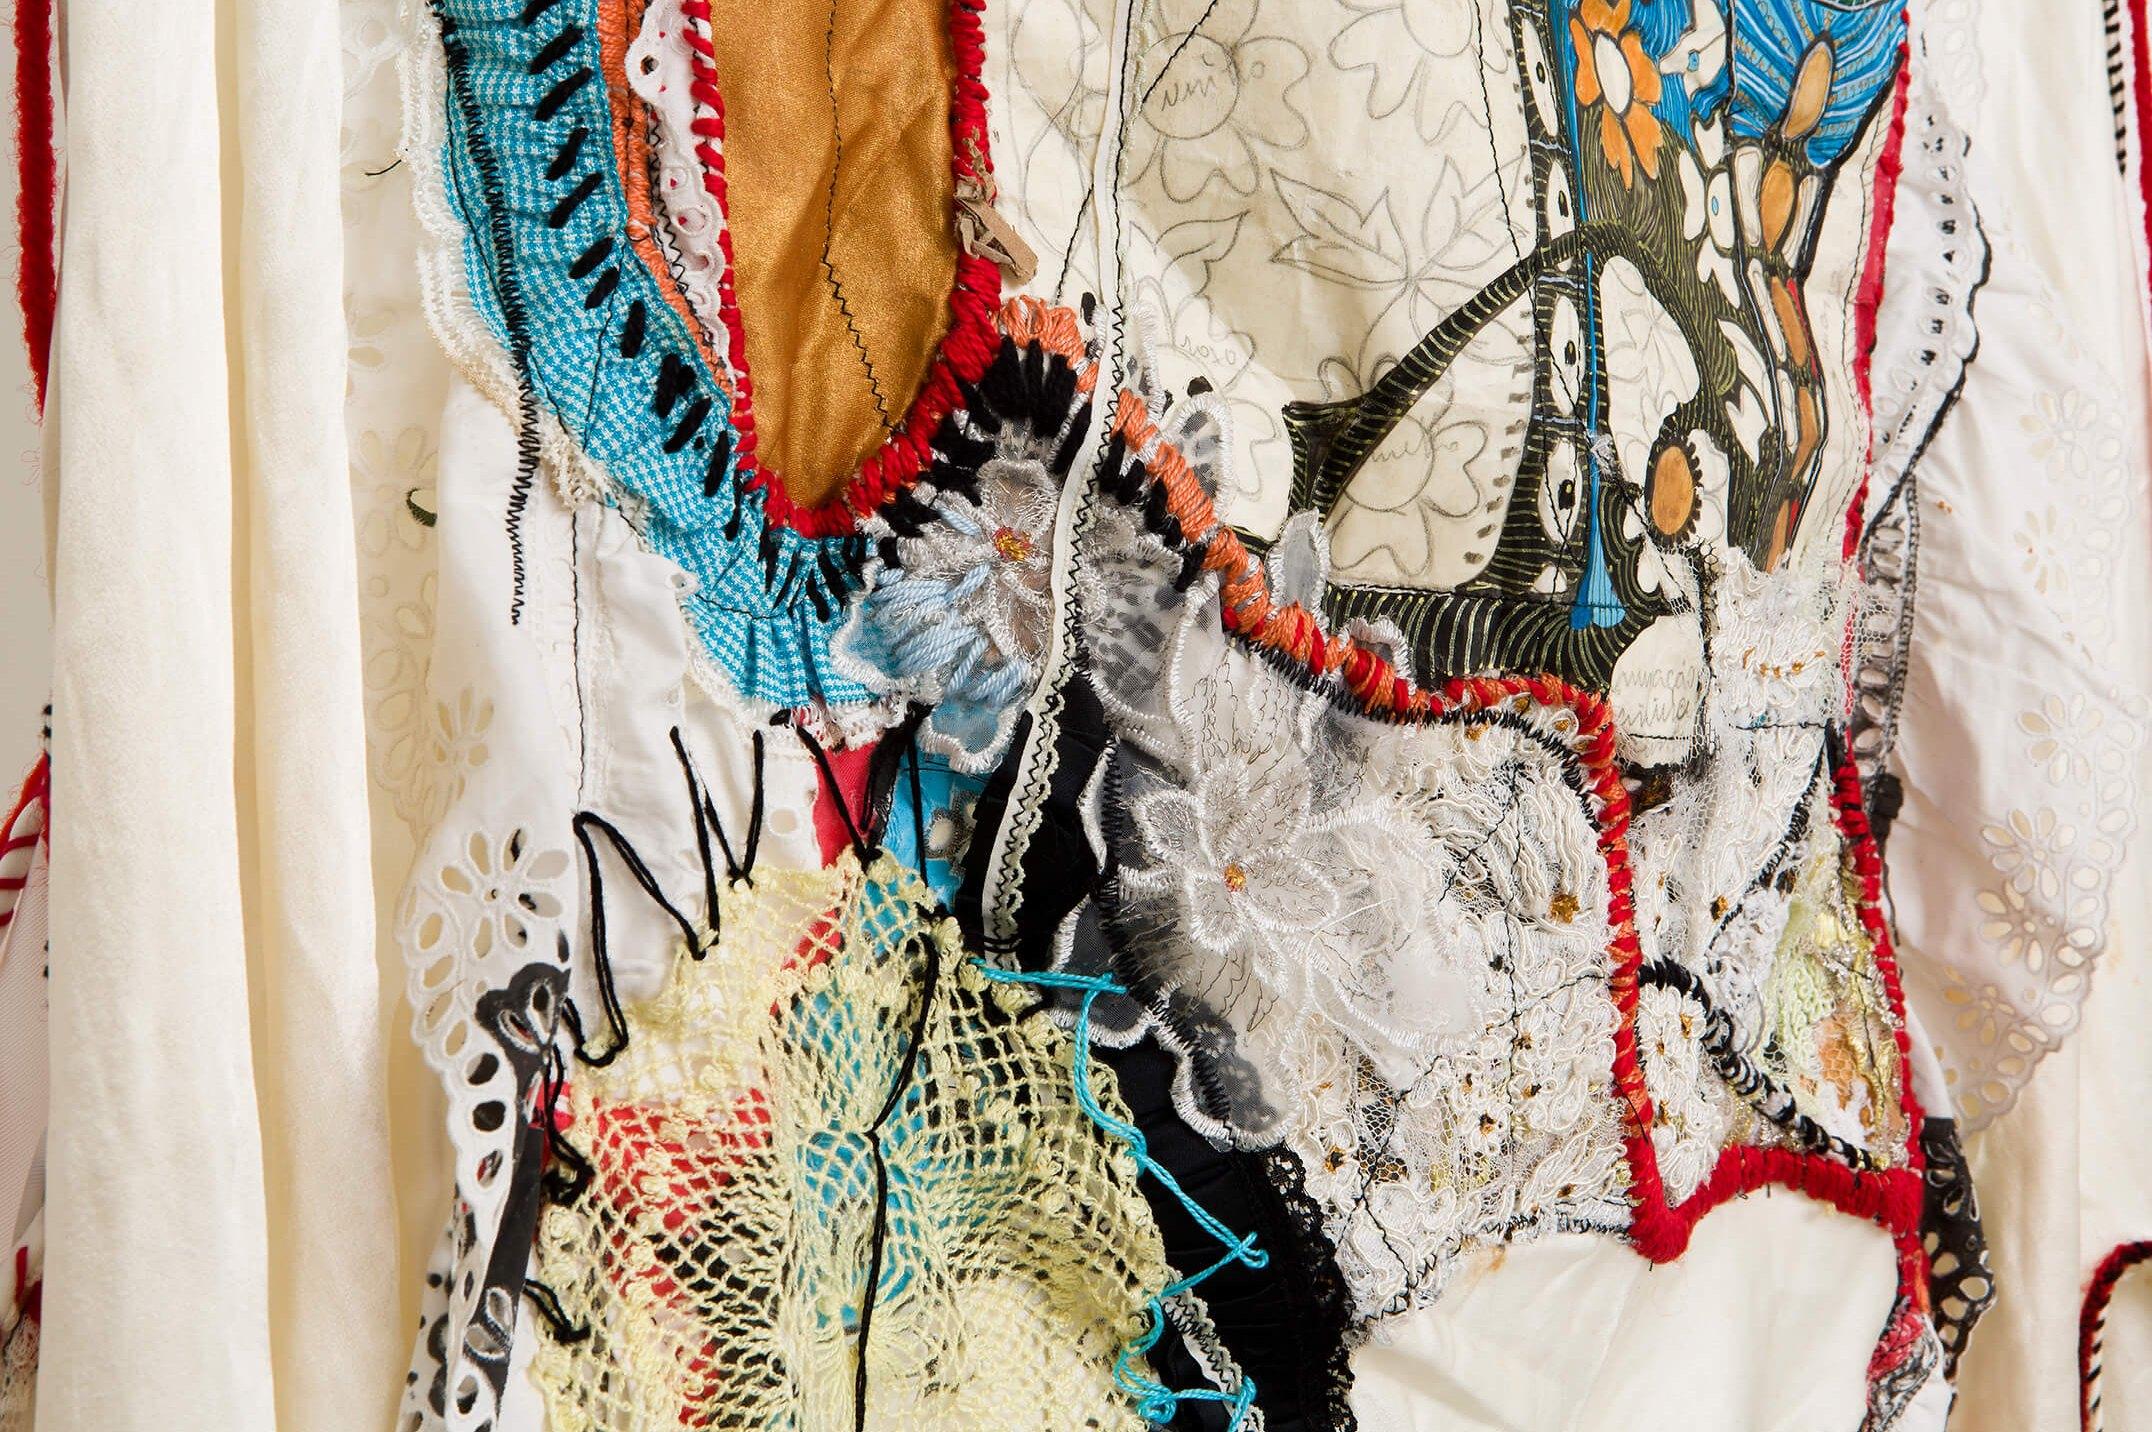 Sonia Gomes,<em>Tecendo Amanhã I</em>, 2016,stitching, bindings, different fabrics and laces,193 × 61 × 12 cm - Mendes Wood DM